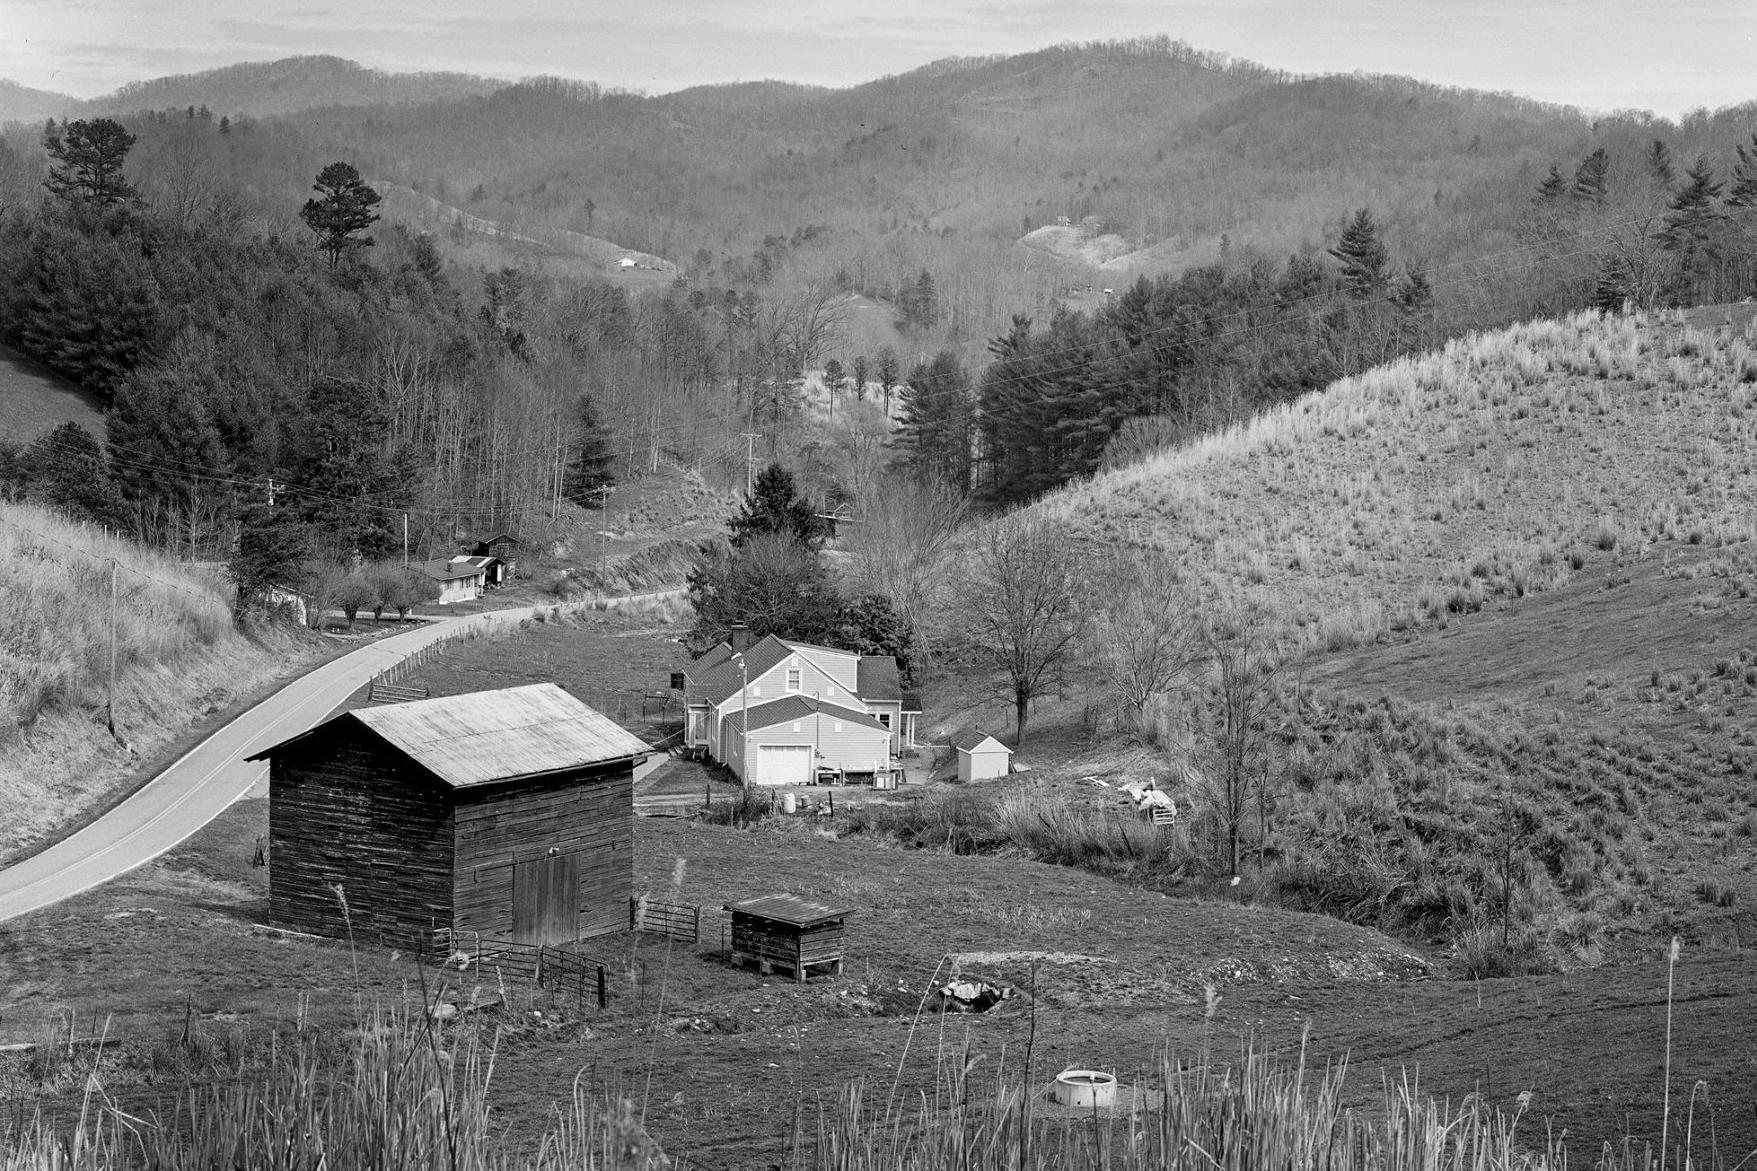 Barn, house, moutain 2-3 bw.jpg